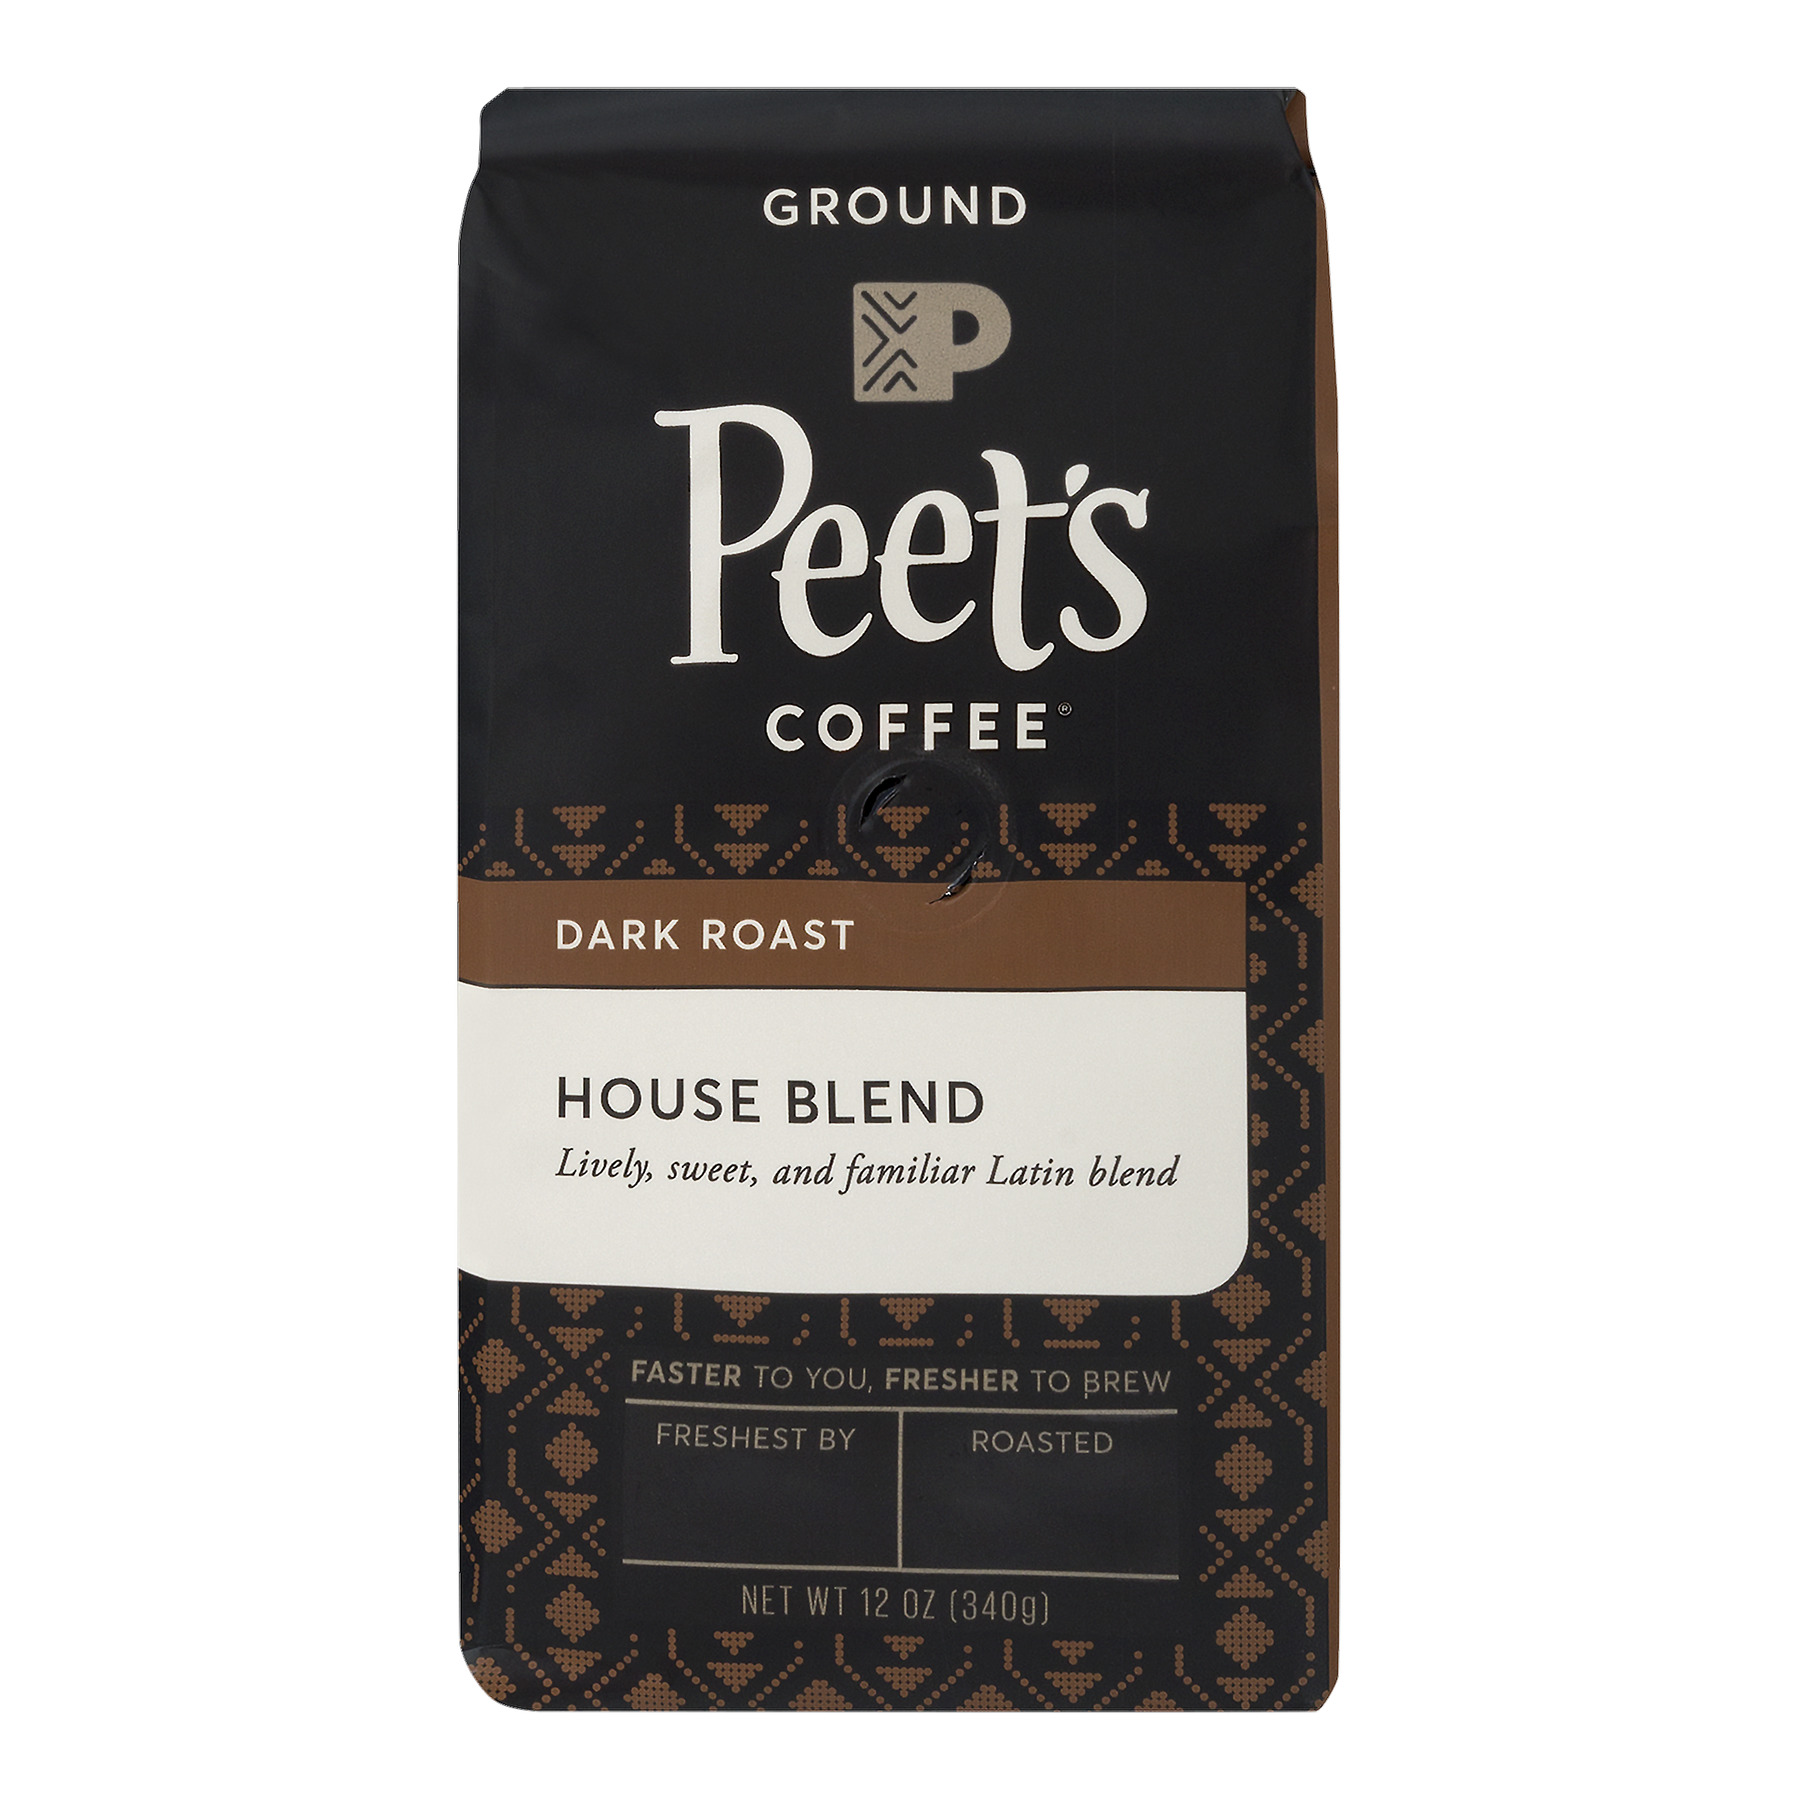 Peet's Coffee® House Blend Dark Roast Ground Coffee 12 oz. Stand-Up Bag